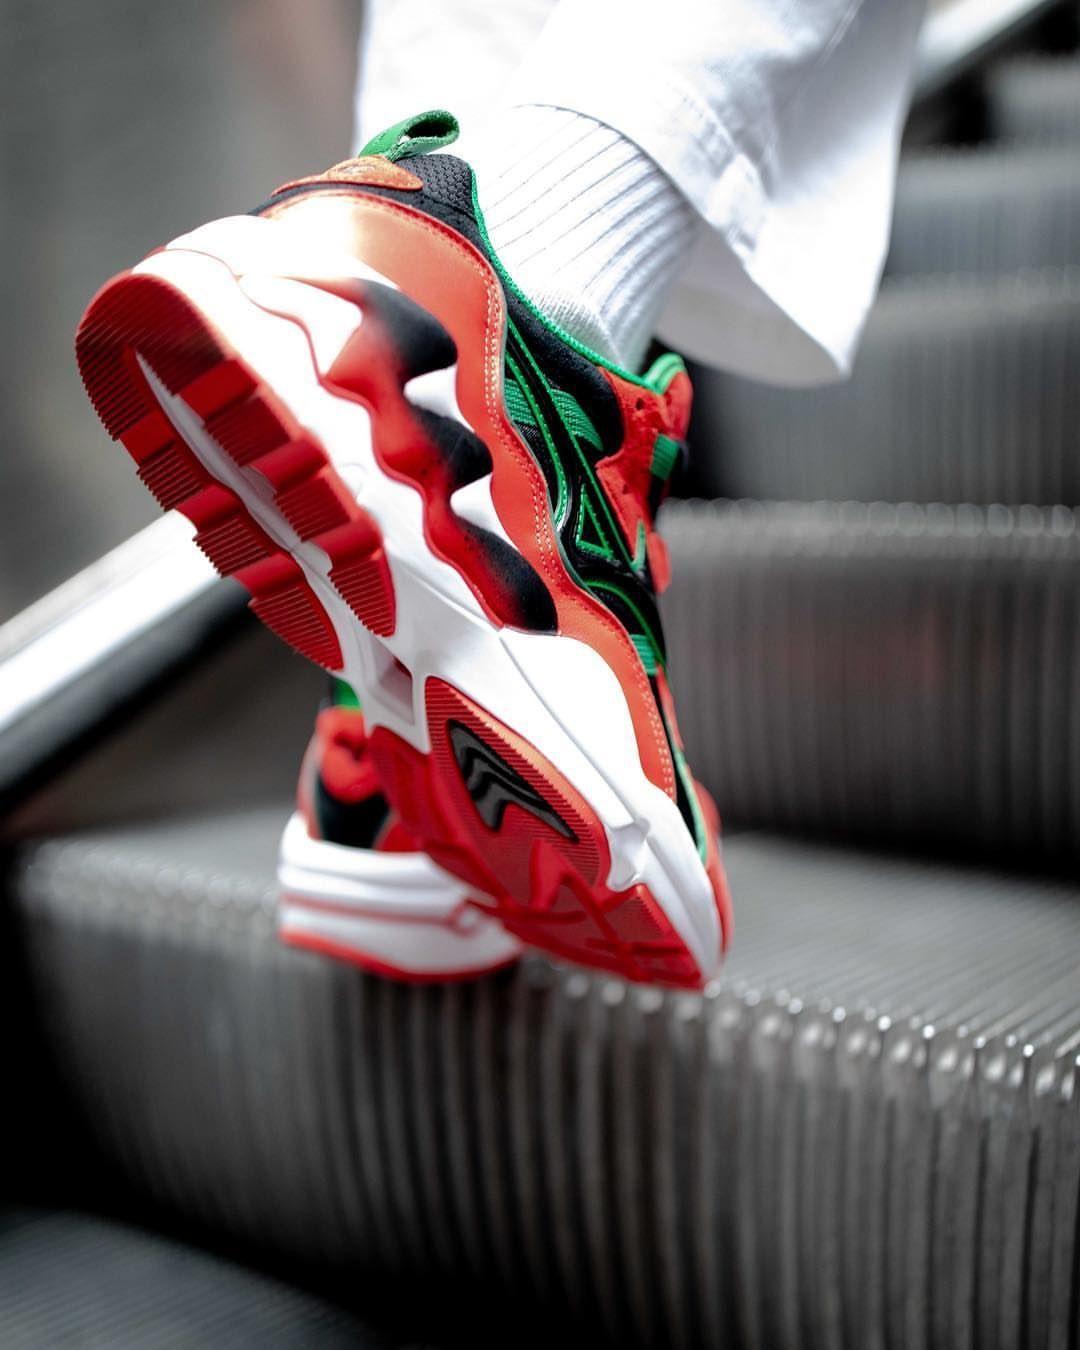 mizuno mens running shoes size 9 yeezy usados hombres